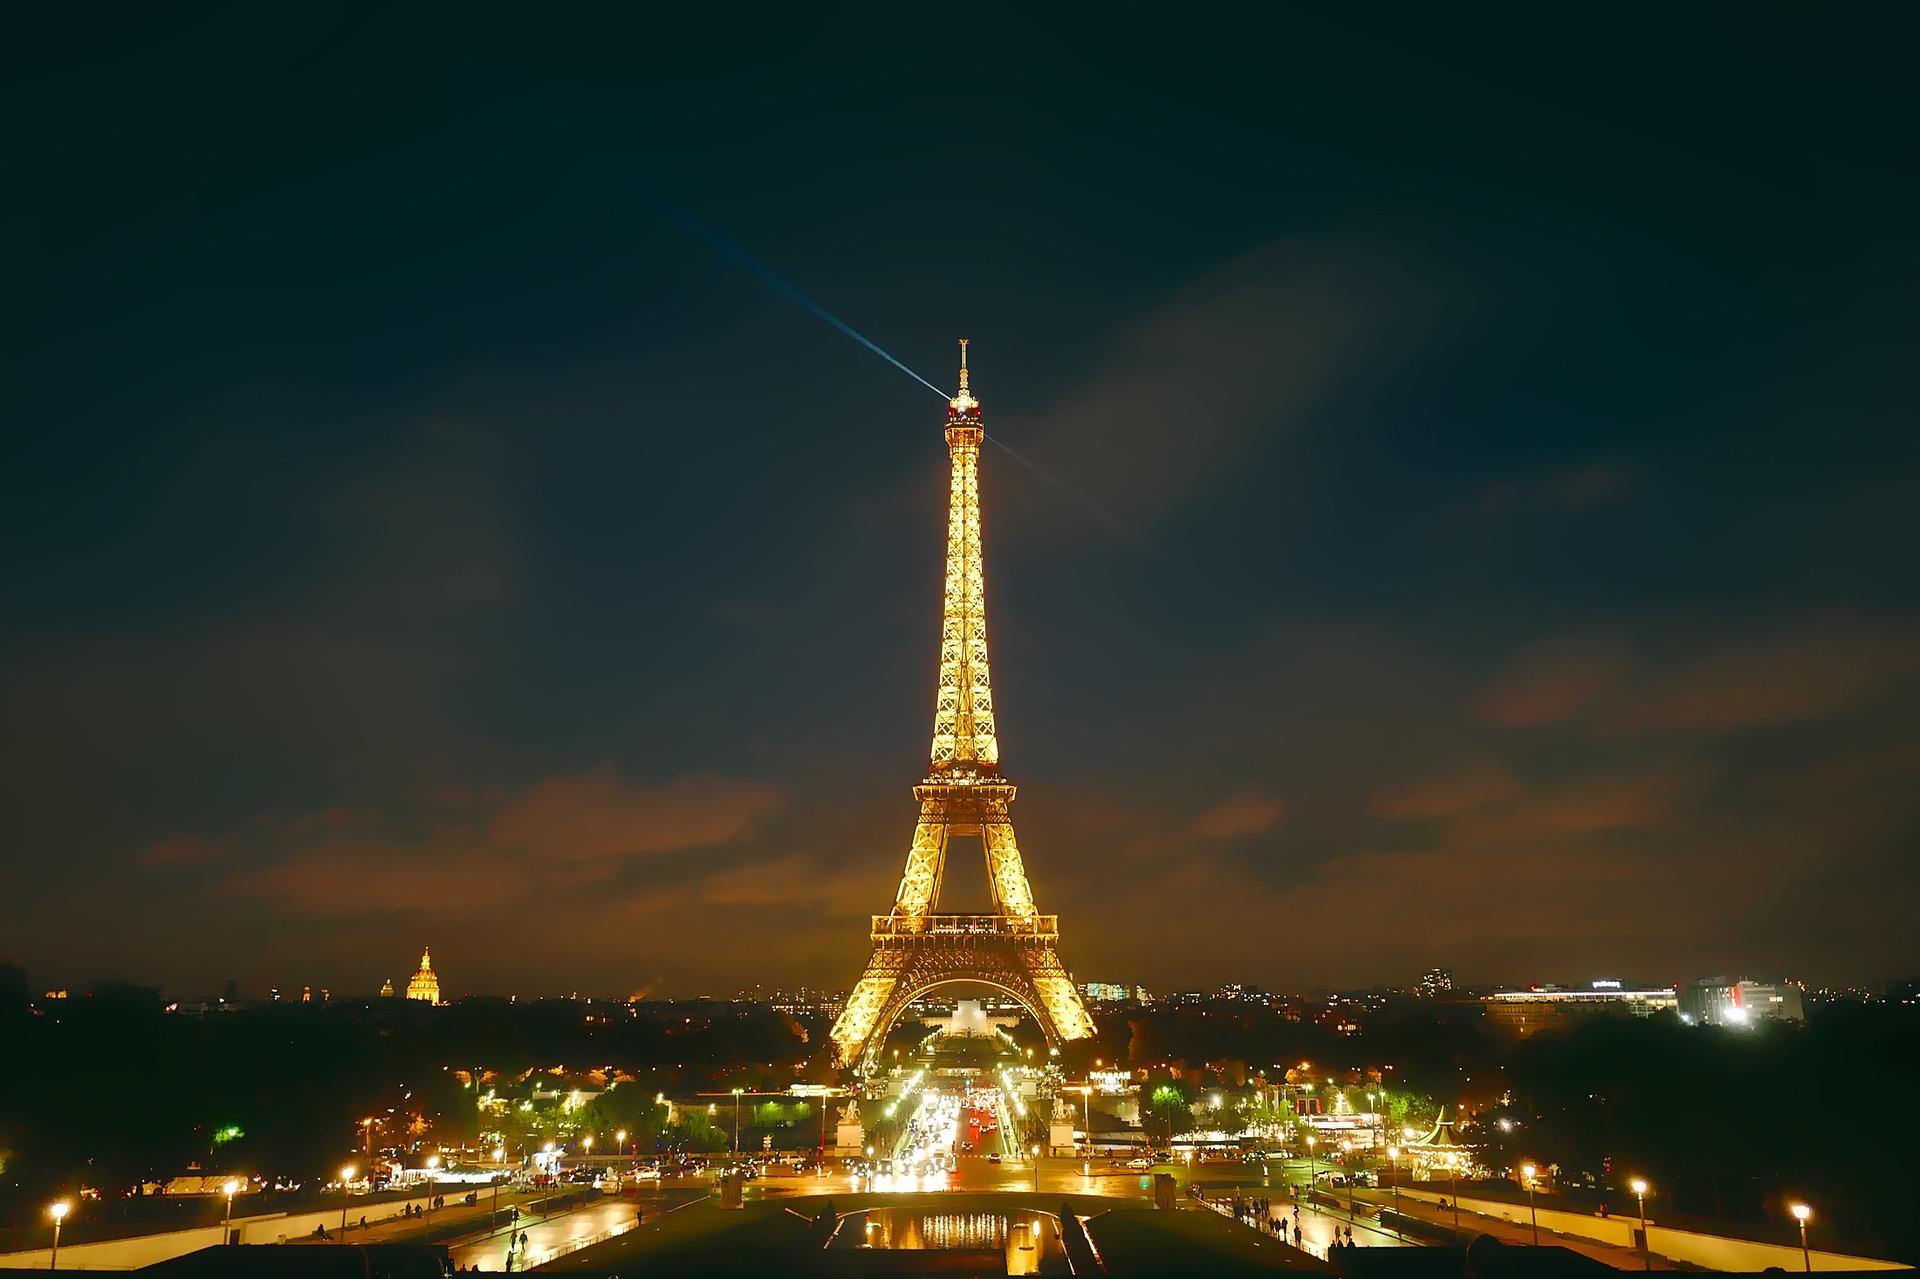 paris-1789706_1920.jpg